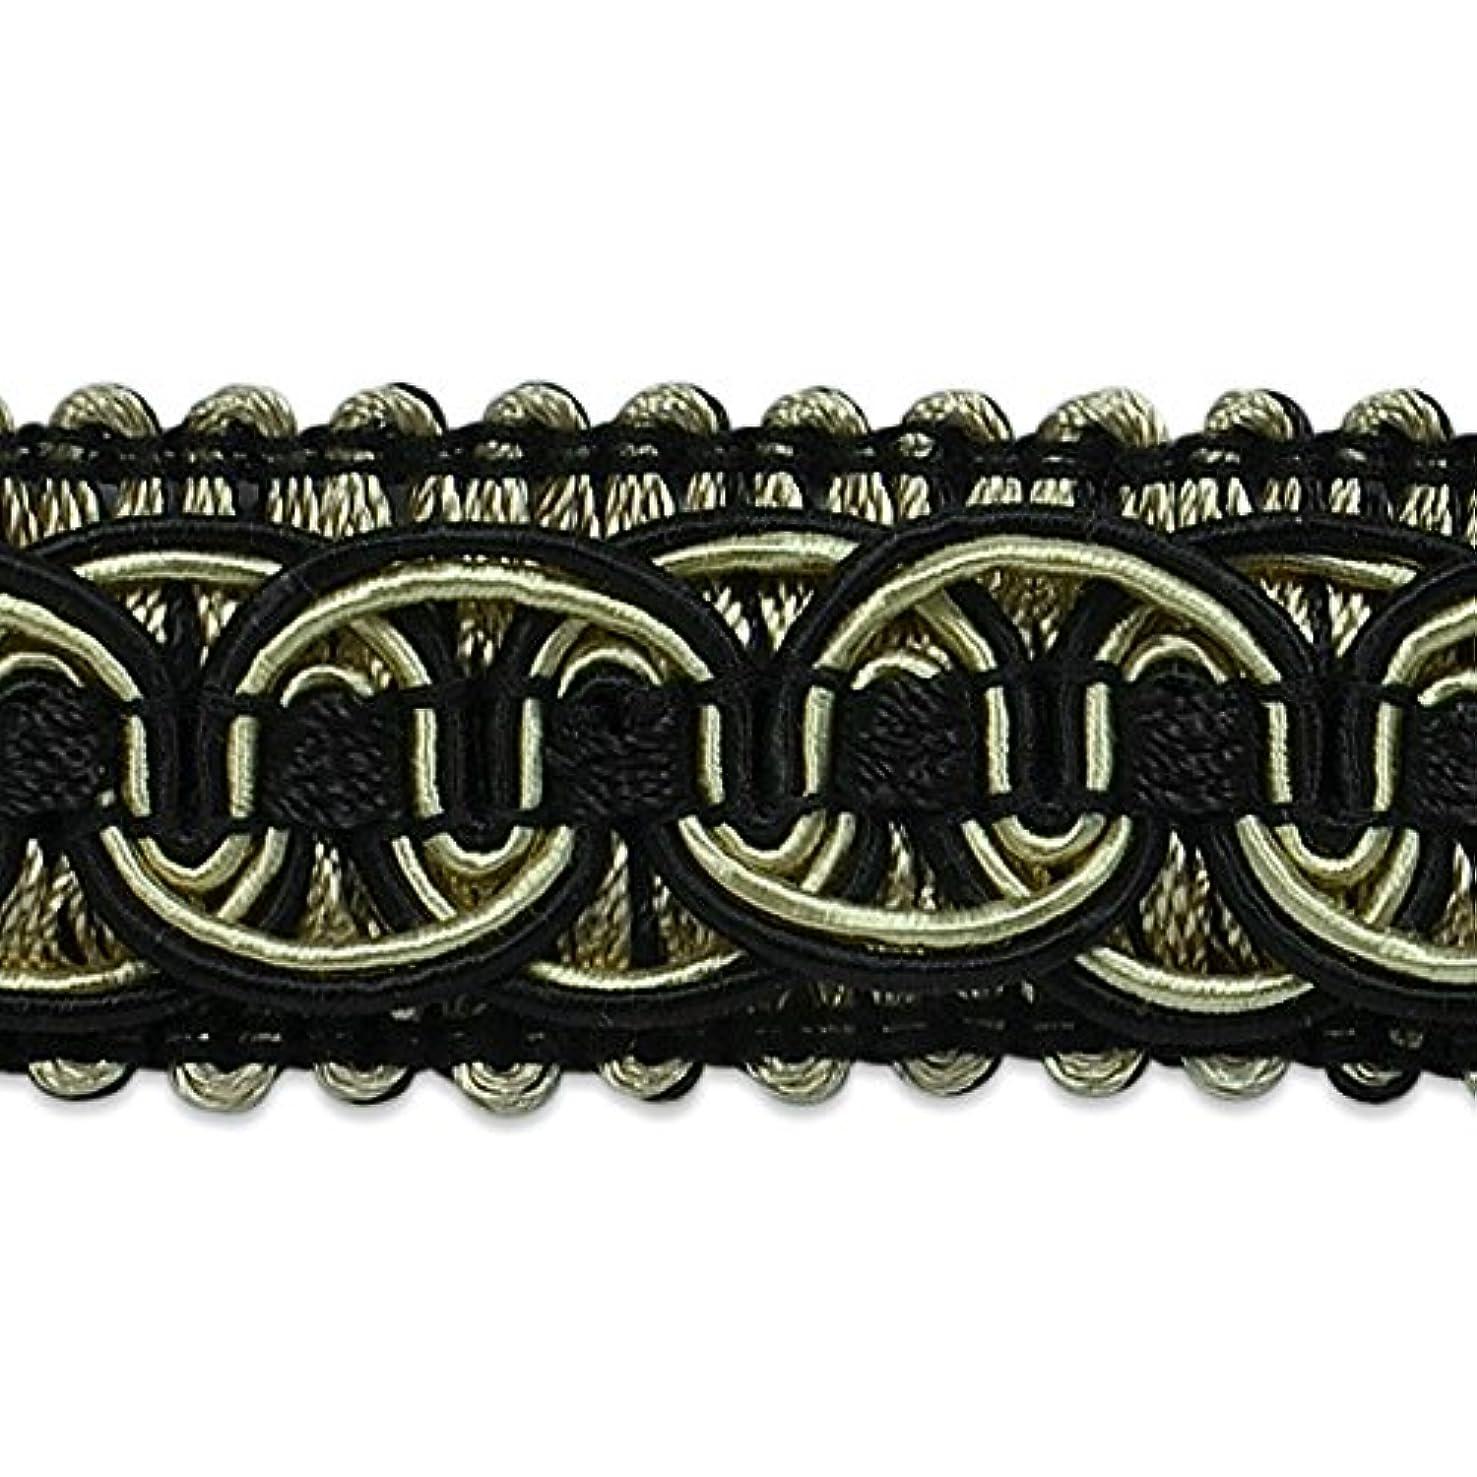 Expo International Preshea Circle Braid Trim Embellishment, 20-Yard, Black